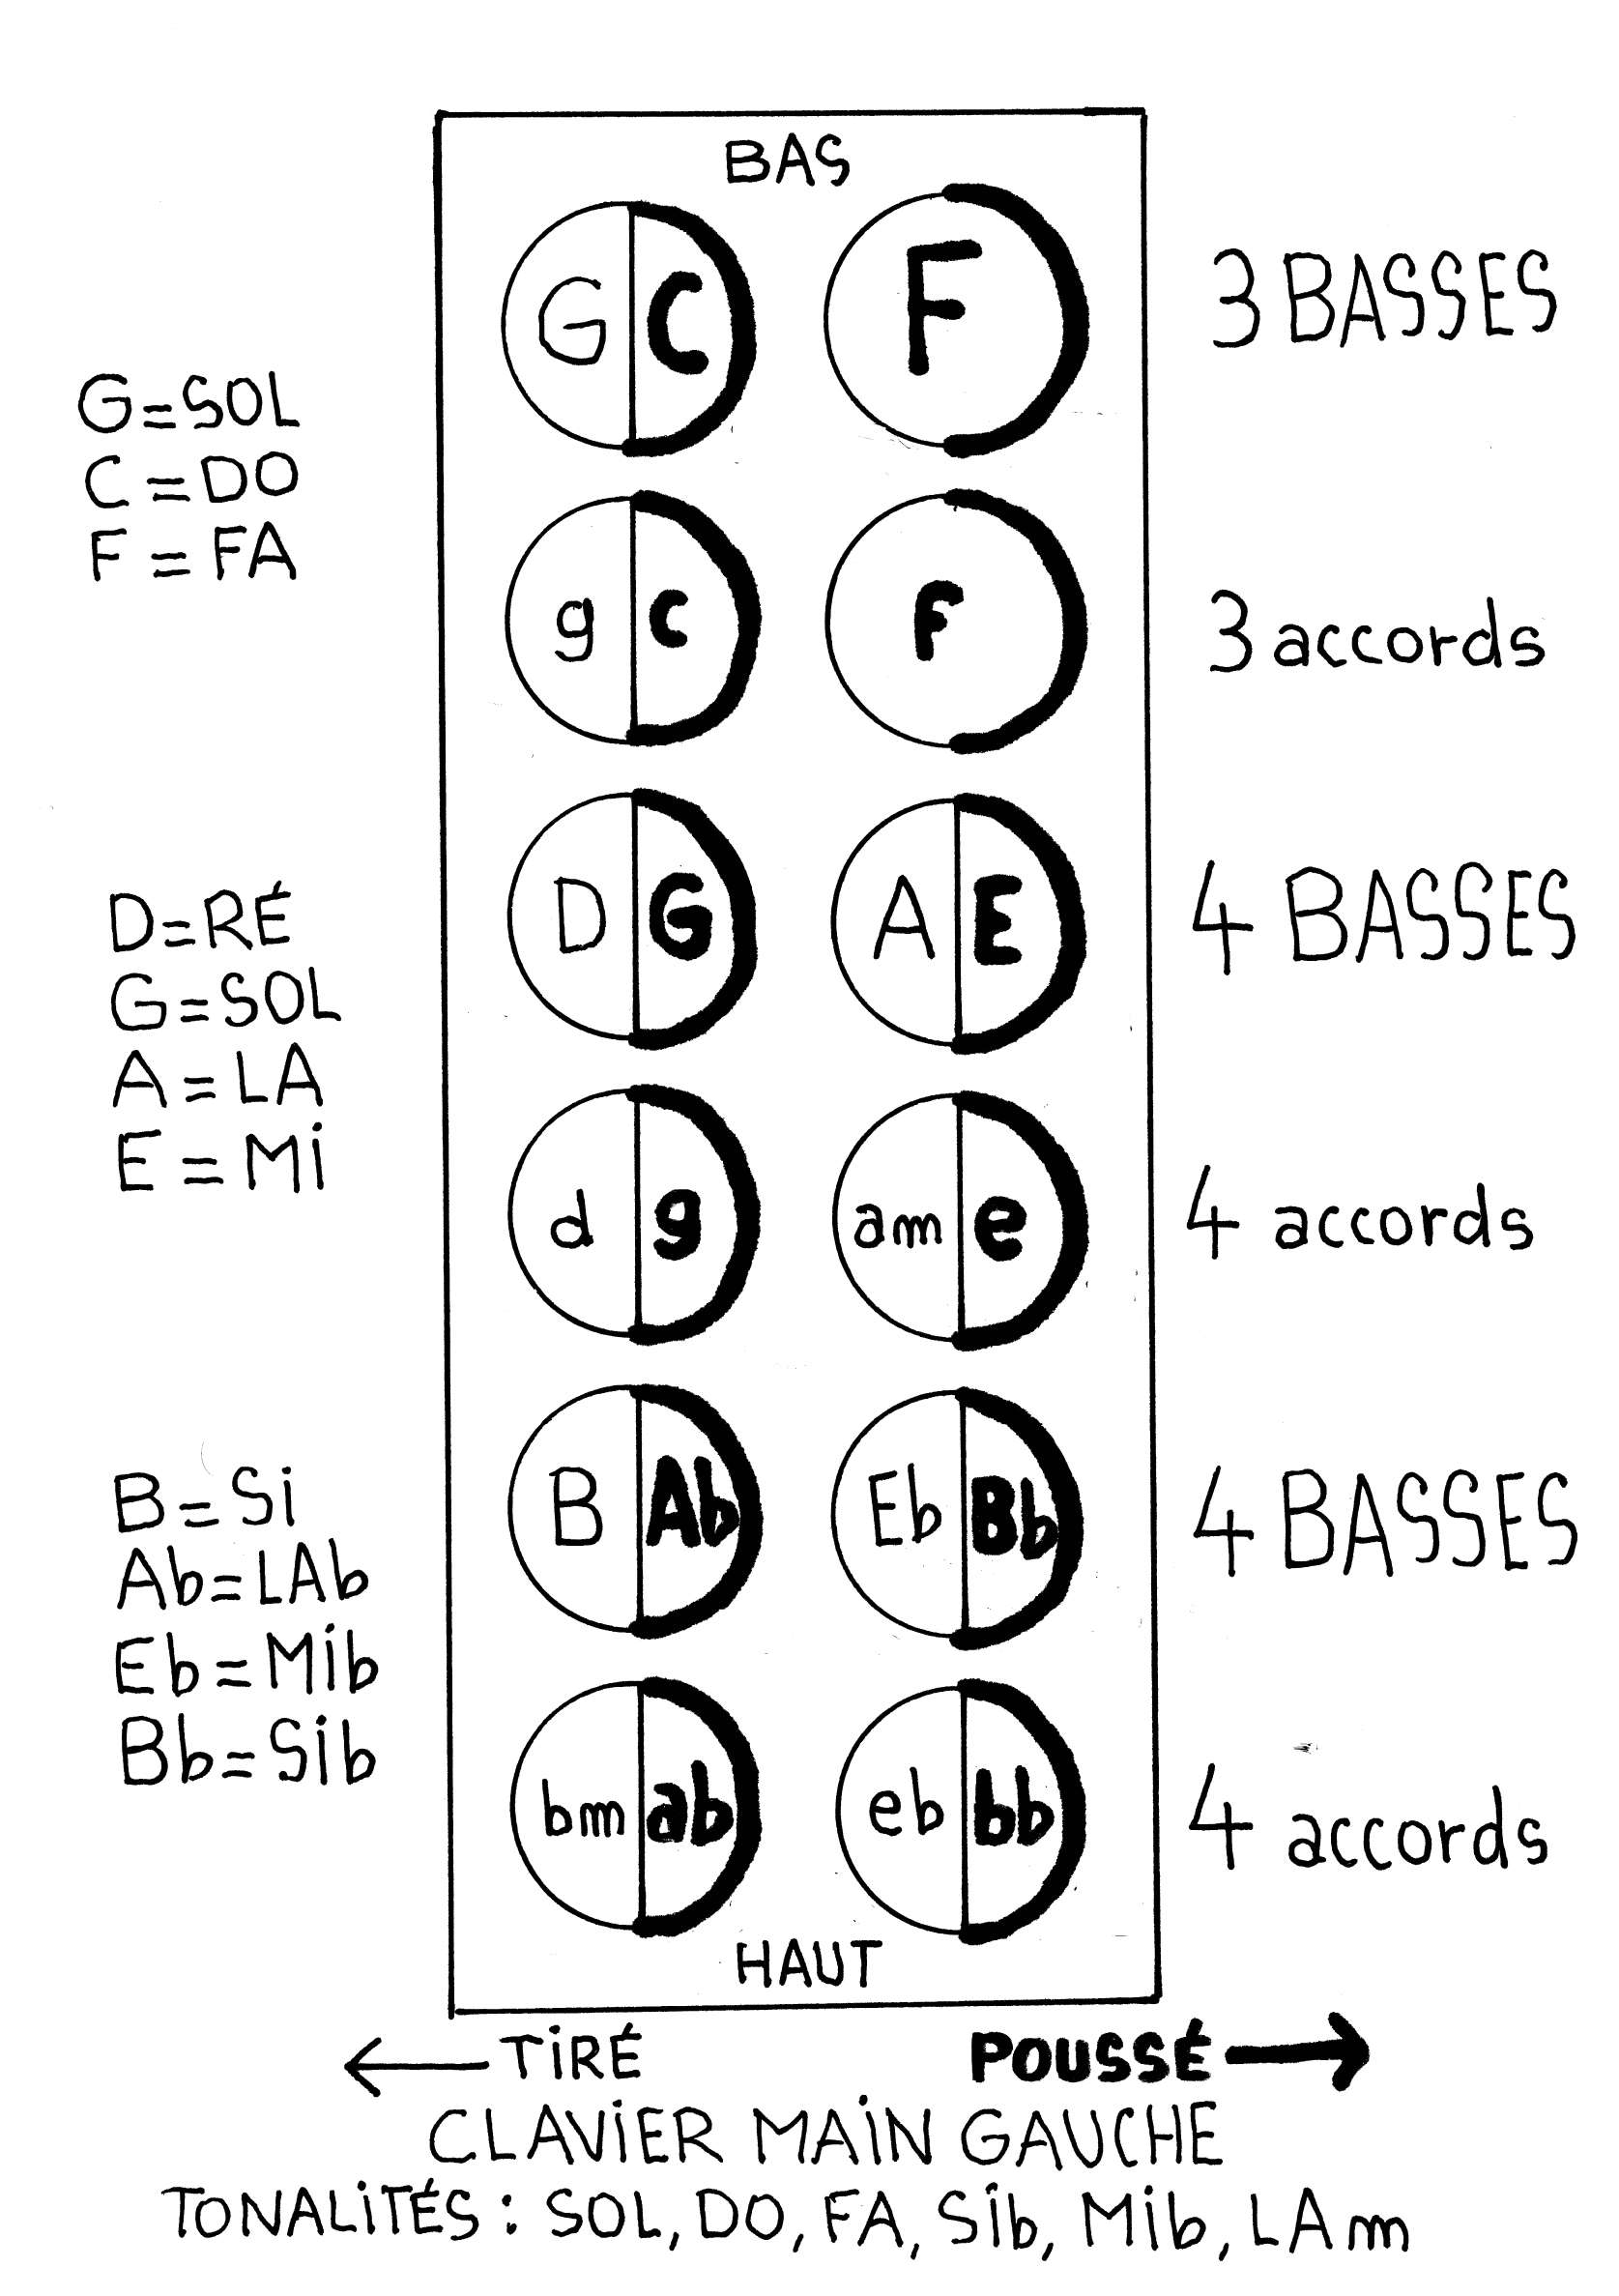 Clavier main gauche 12 basses